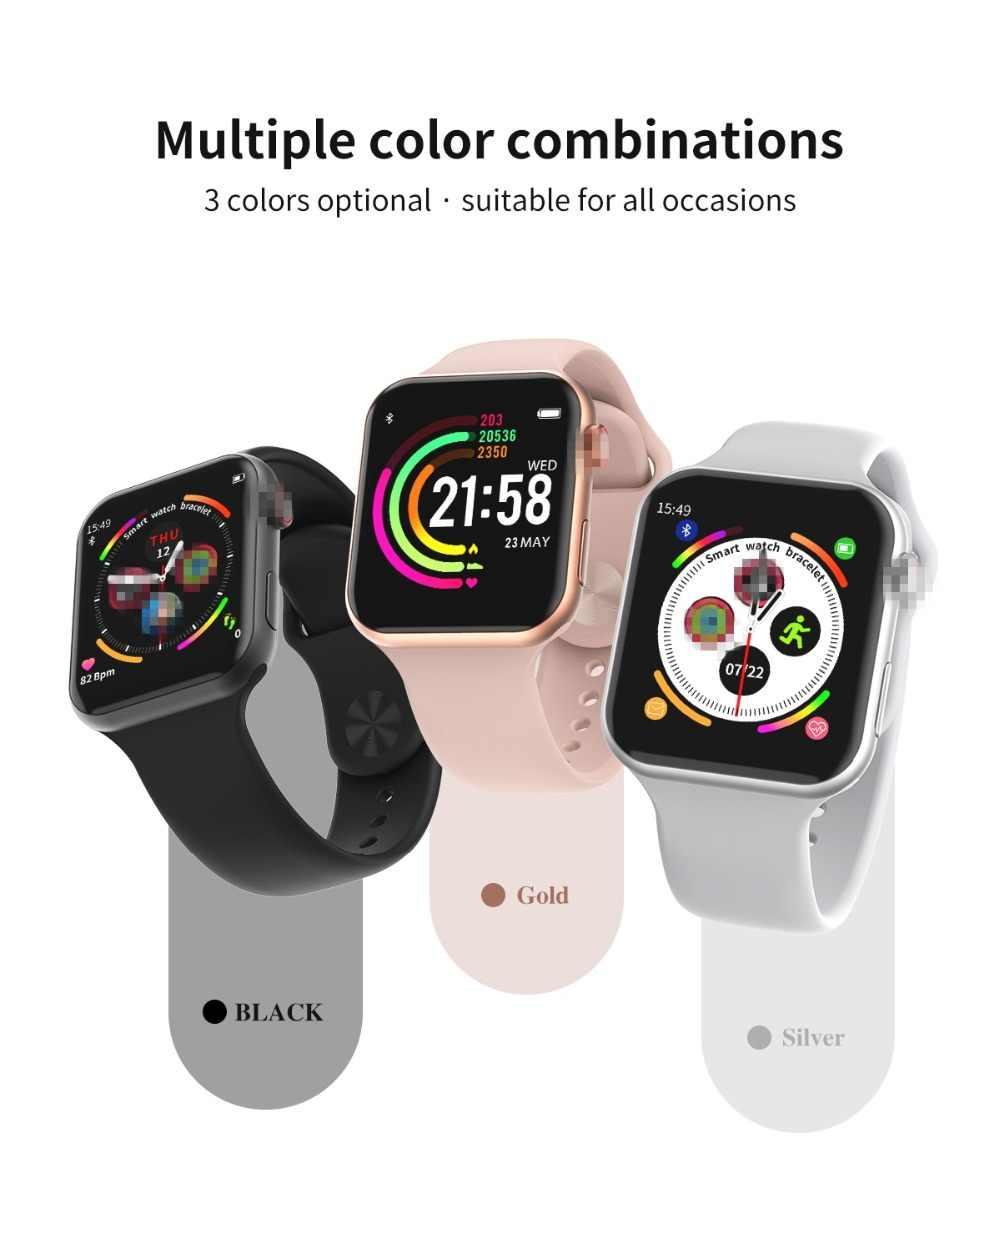 Smartwatch Relogio Digital Watch Series 4 Siri PK Iwo 8 PLUS W54 Bluetooth Smartwatch Pria Wei Sa M U ng Iphone Ponsel